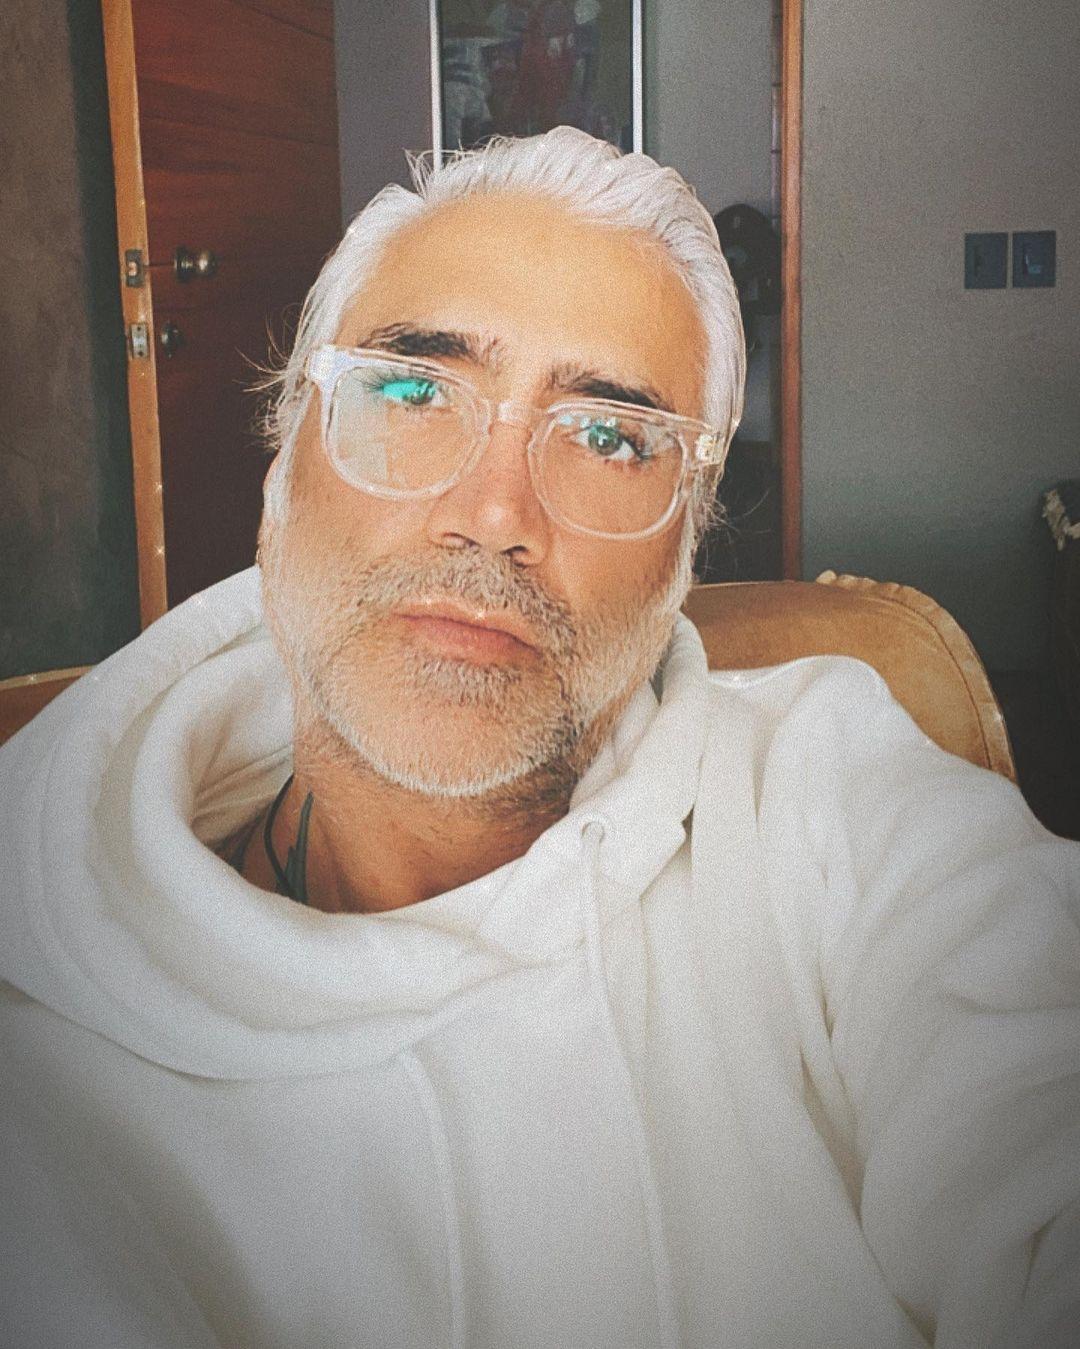 Alejandro Fernandez causa revuelo